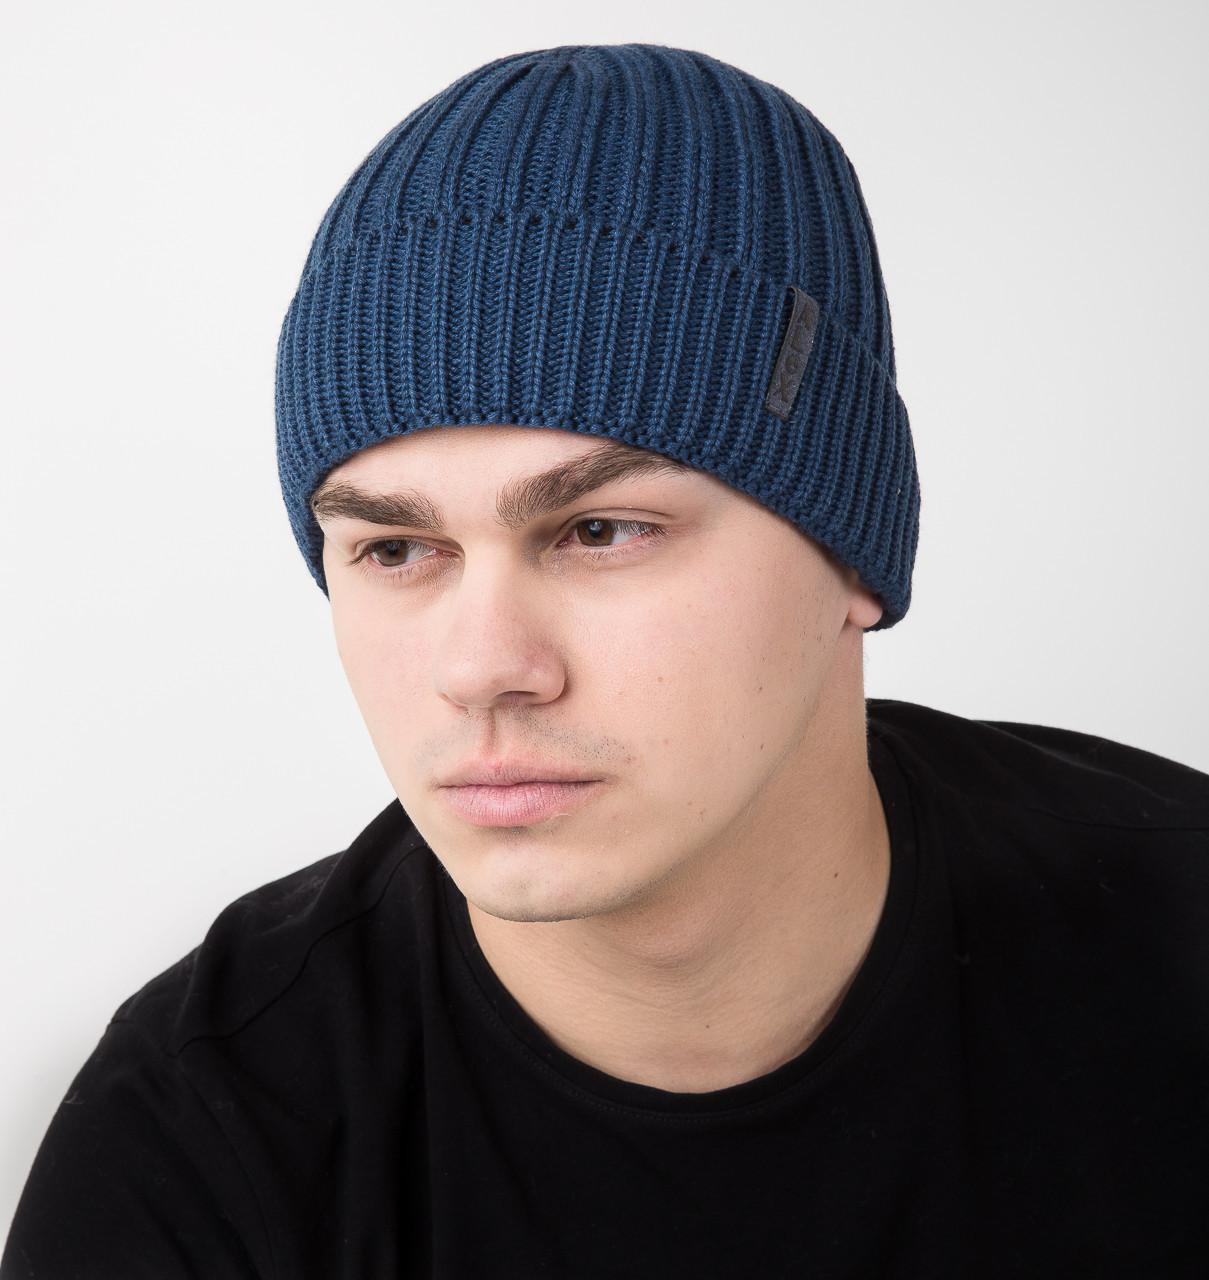 Зимняя мужская шапка на флисе - Арт AL17022